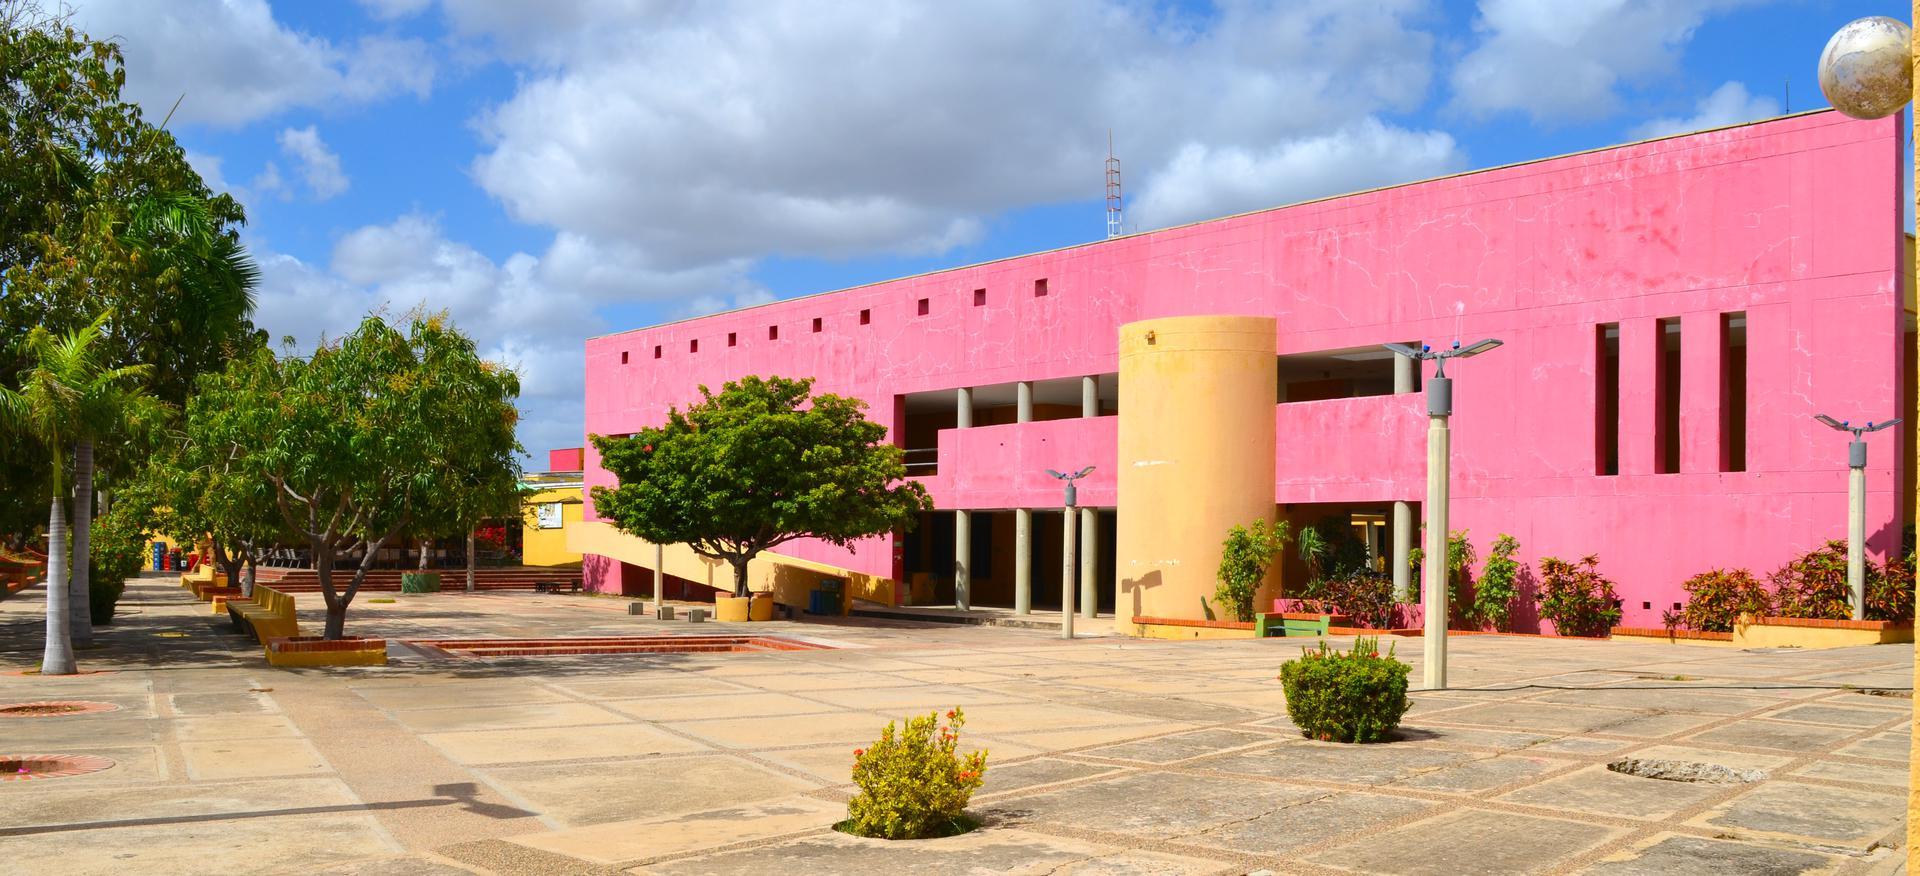 hoyennoticia.com, Uniguajira: Tercera del Caribe en Desempeño Institucional